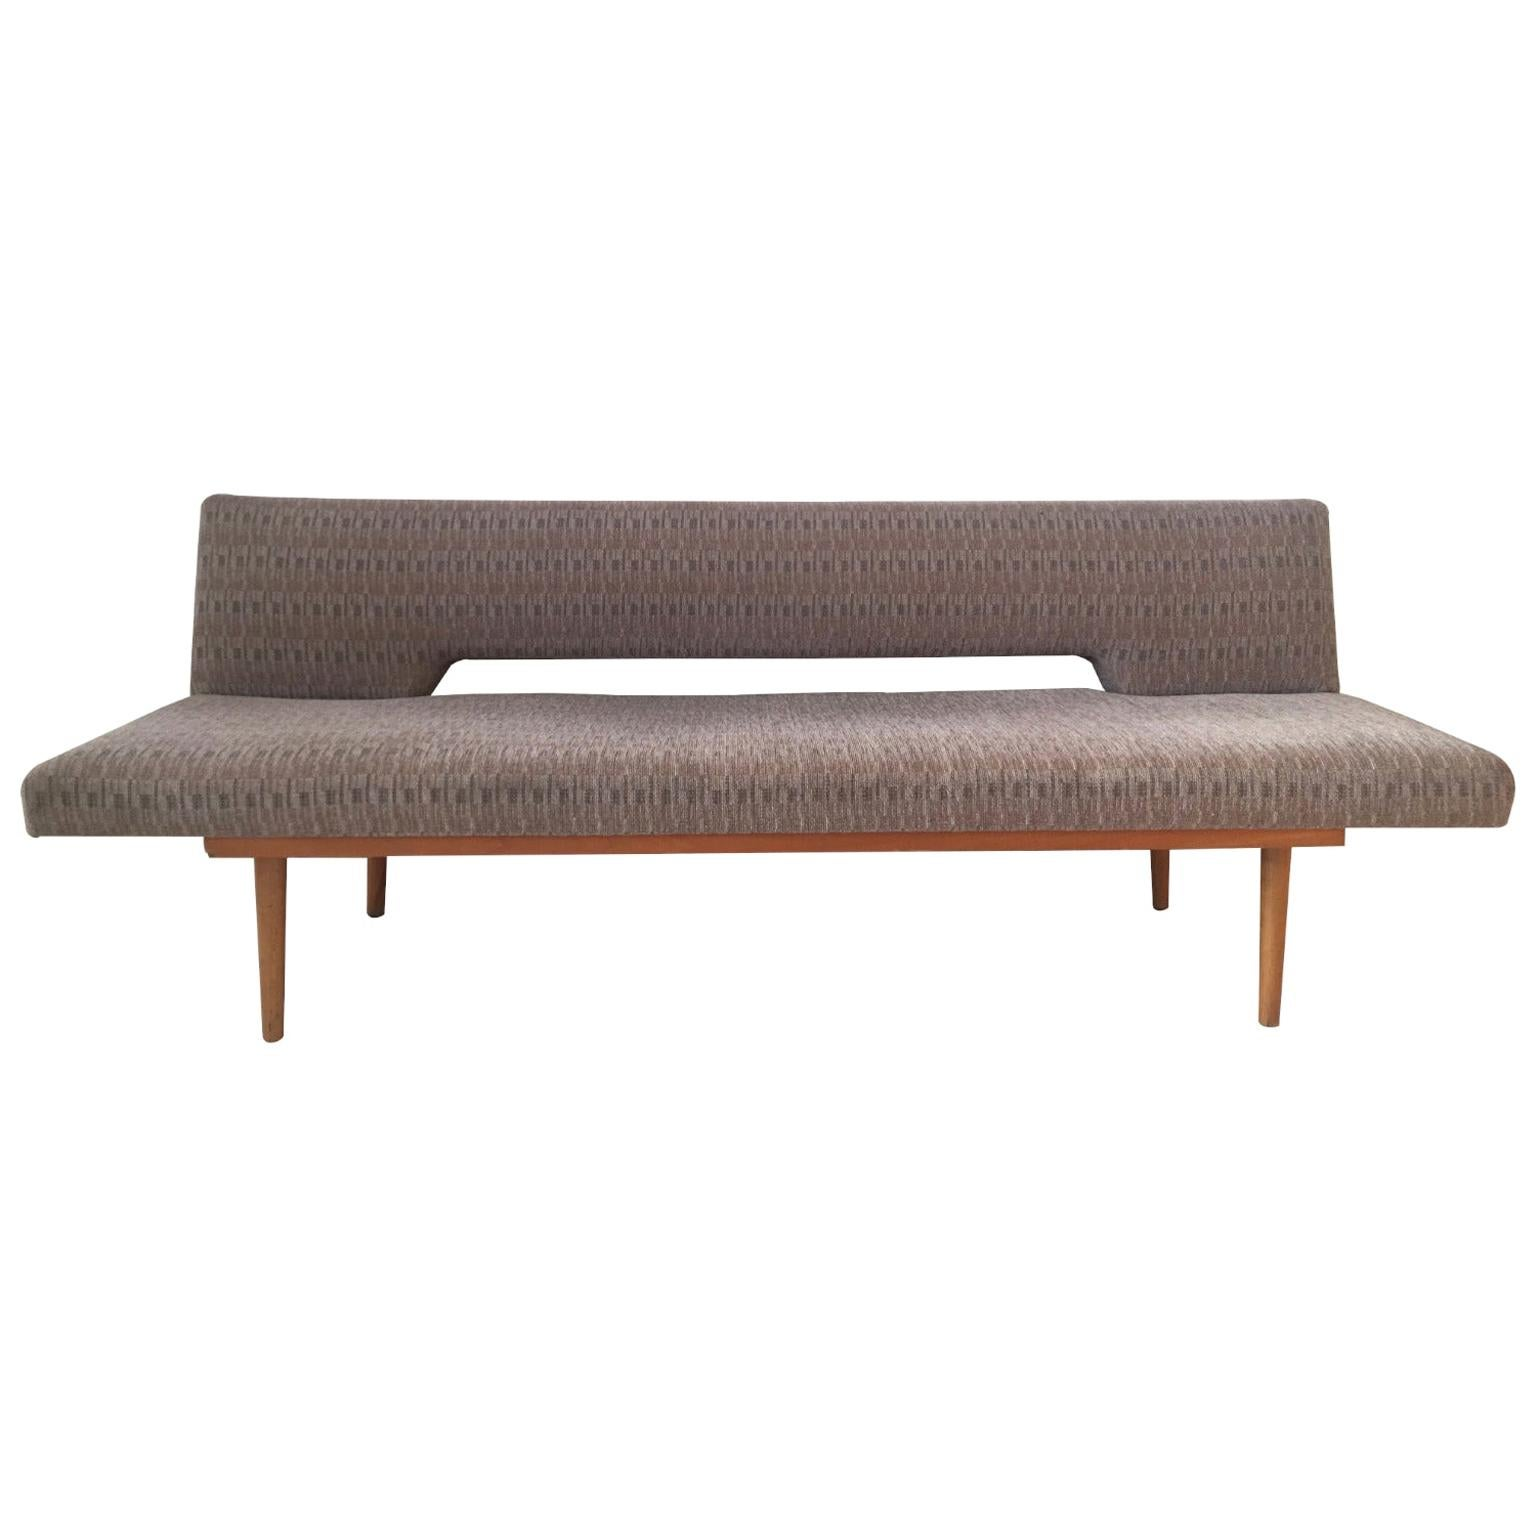 Czechoslovakian Sofa, Sleeper Sofa, Daybed by Miroslav Navratil, 1960s